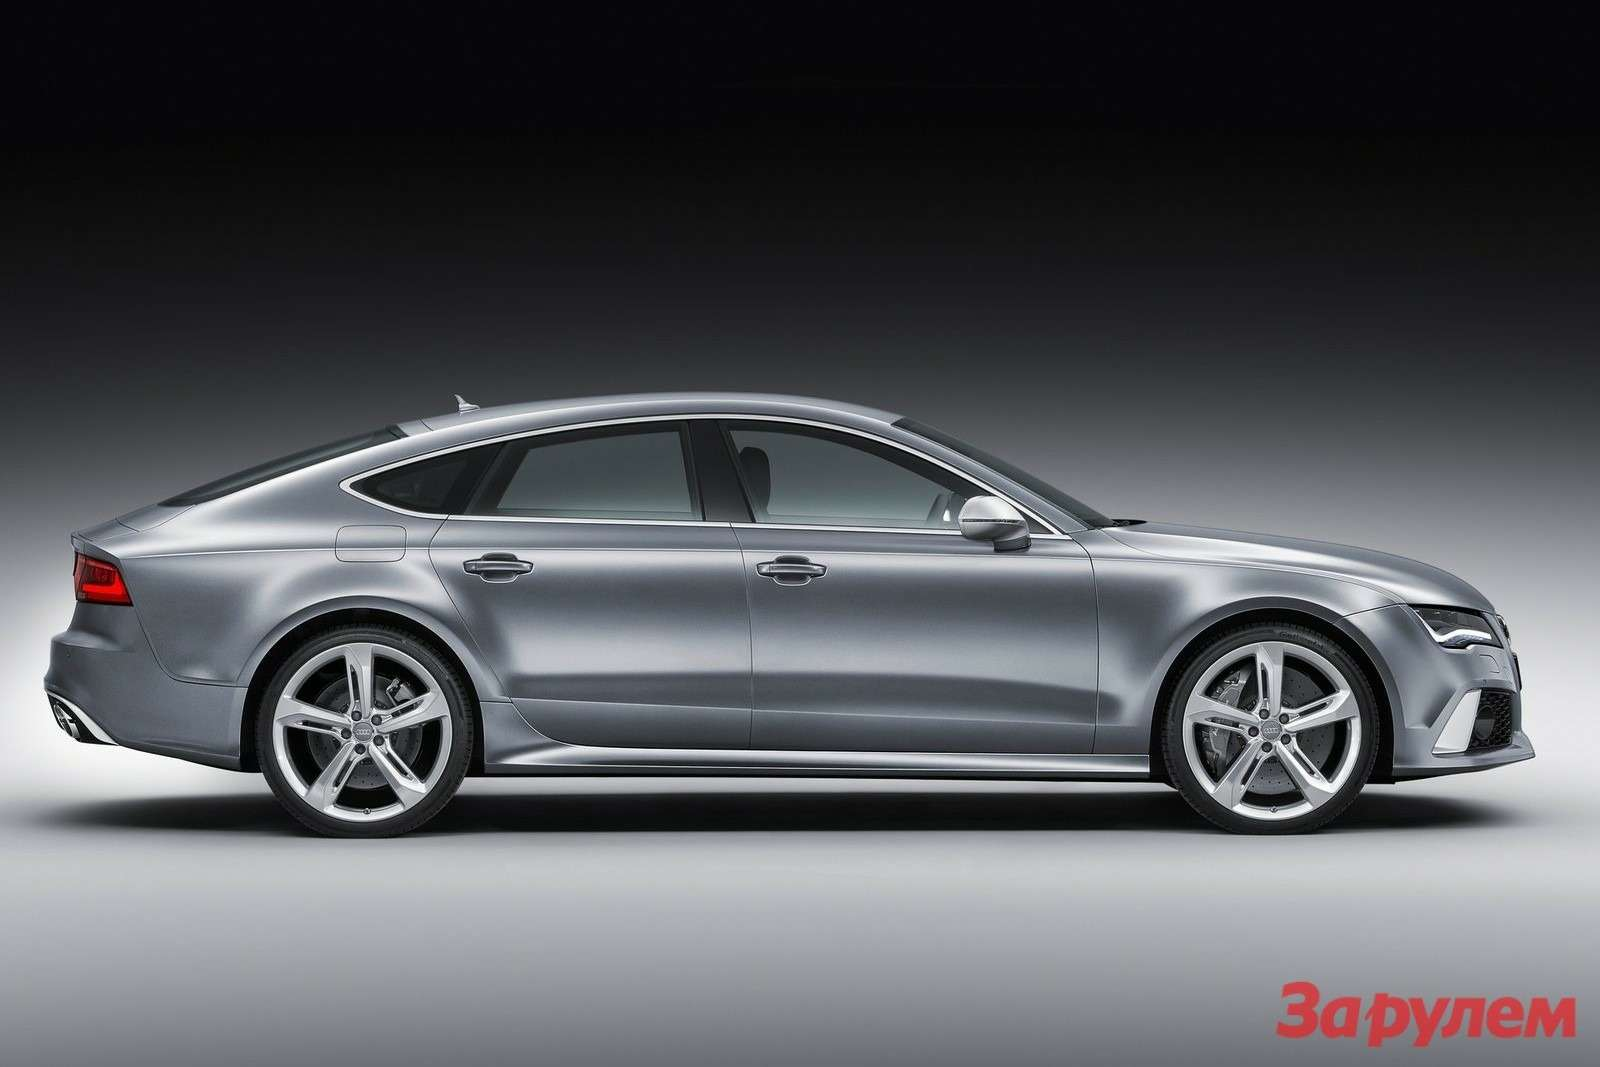 Audi-RS7_Sportback_2014_1600x1200_wallpaper_08